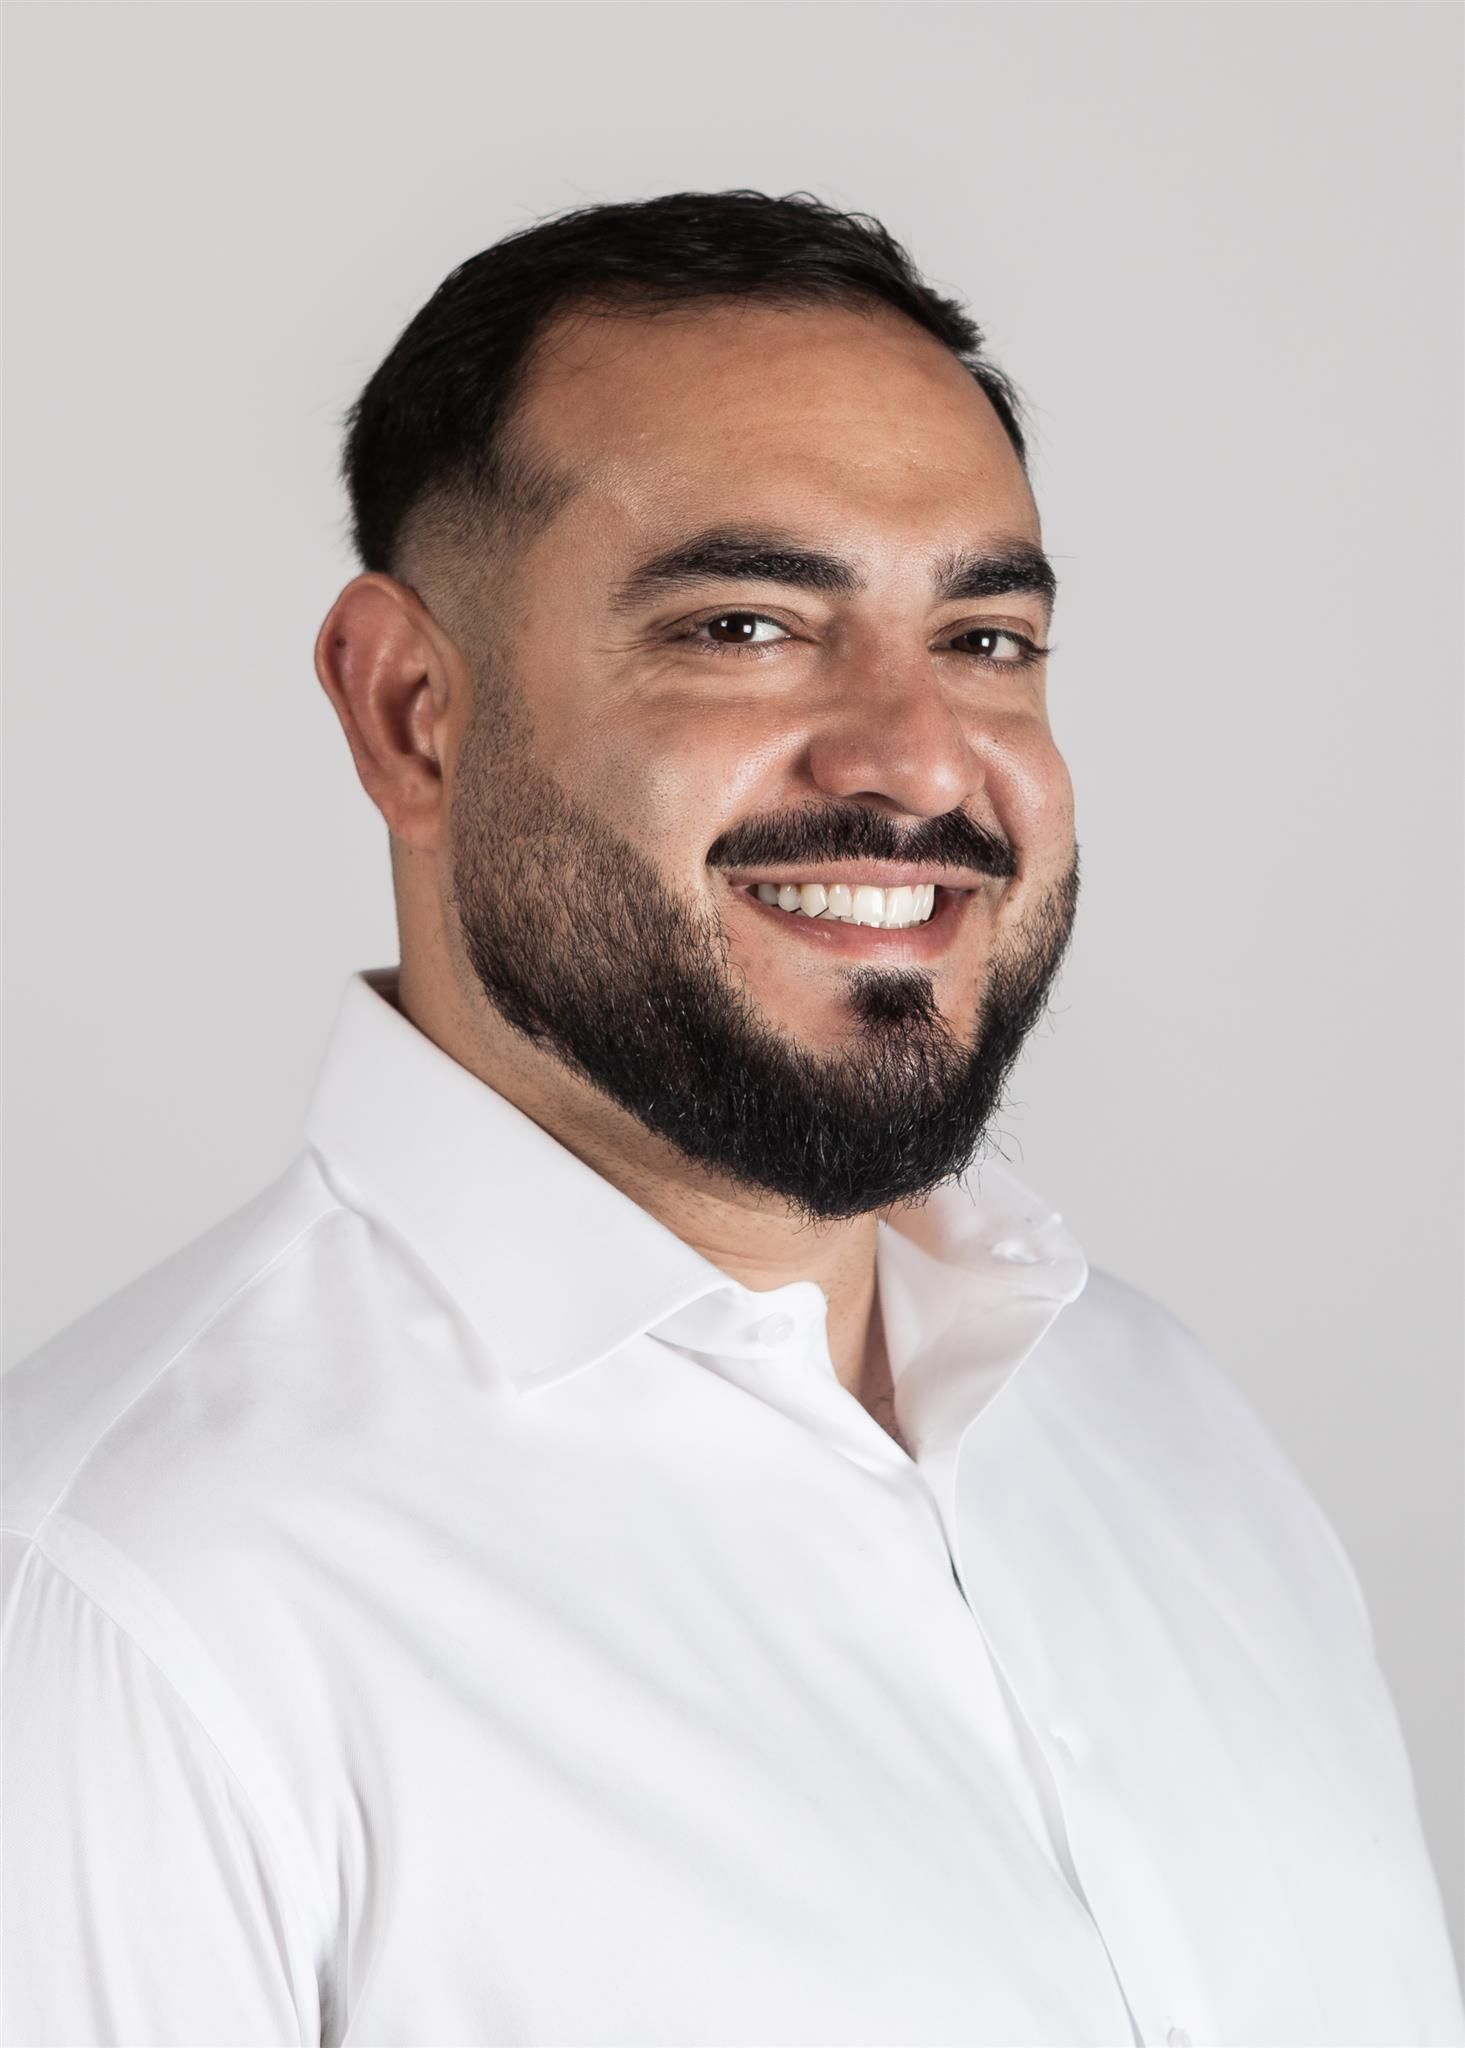 Amir Mirzaee